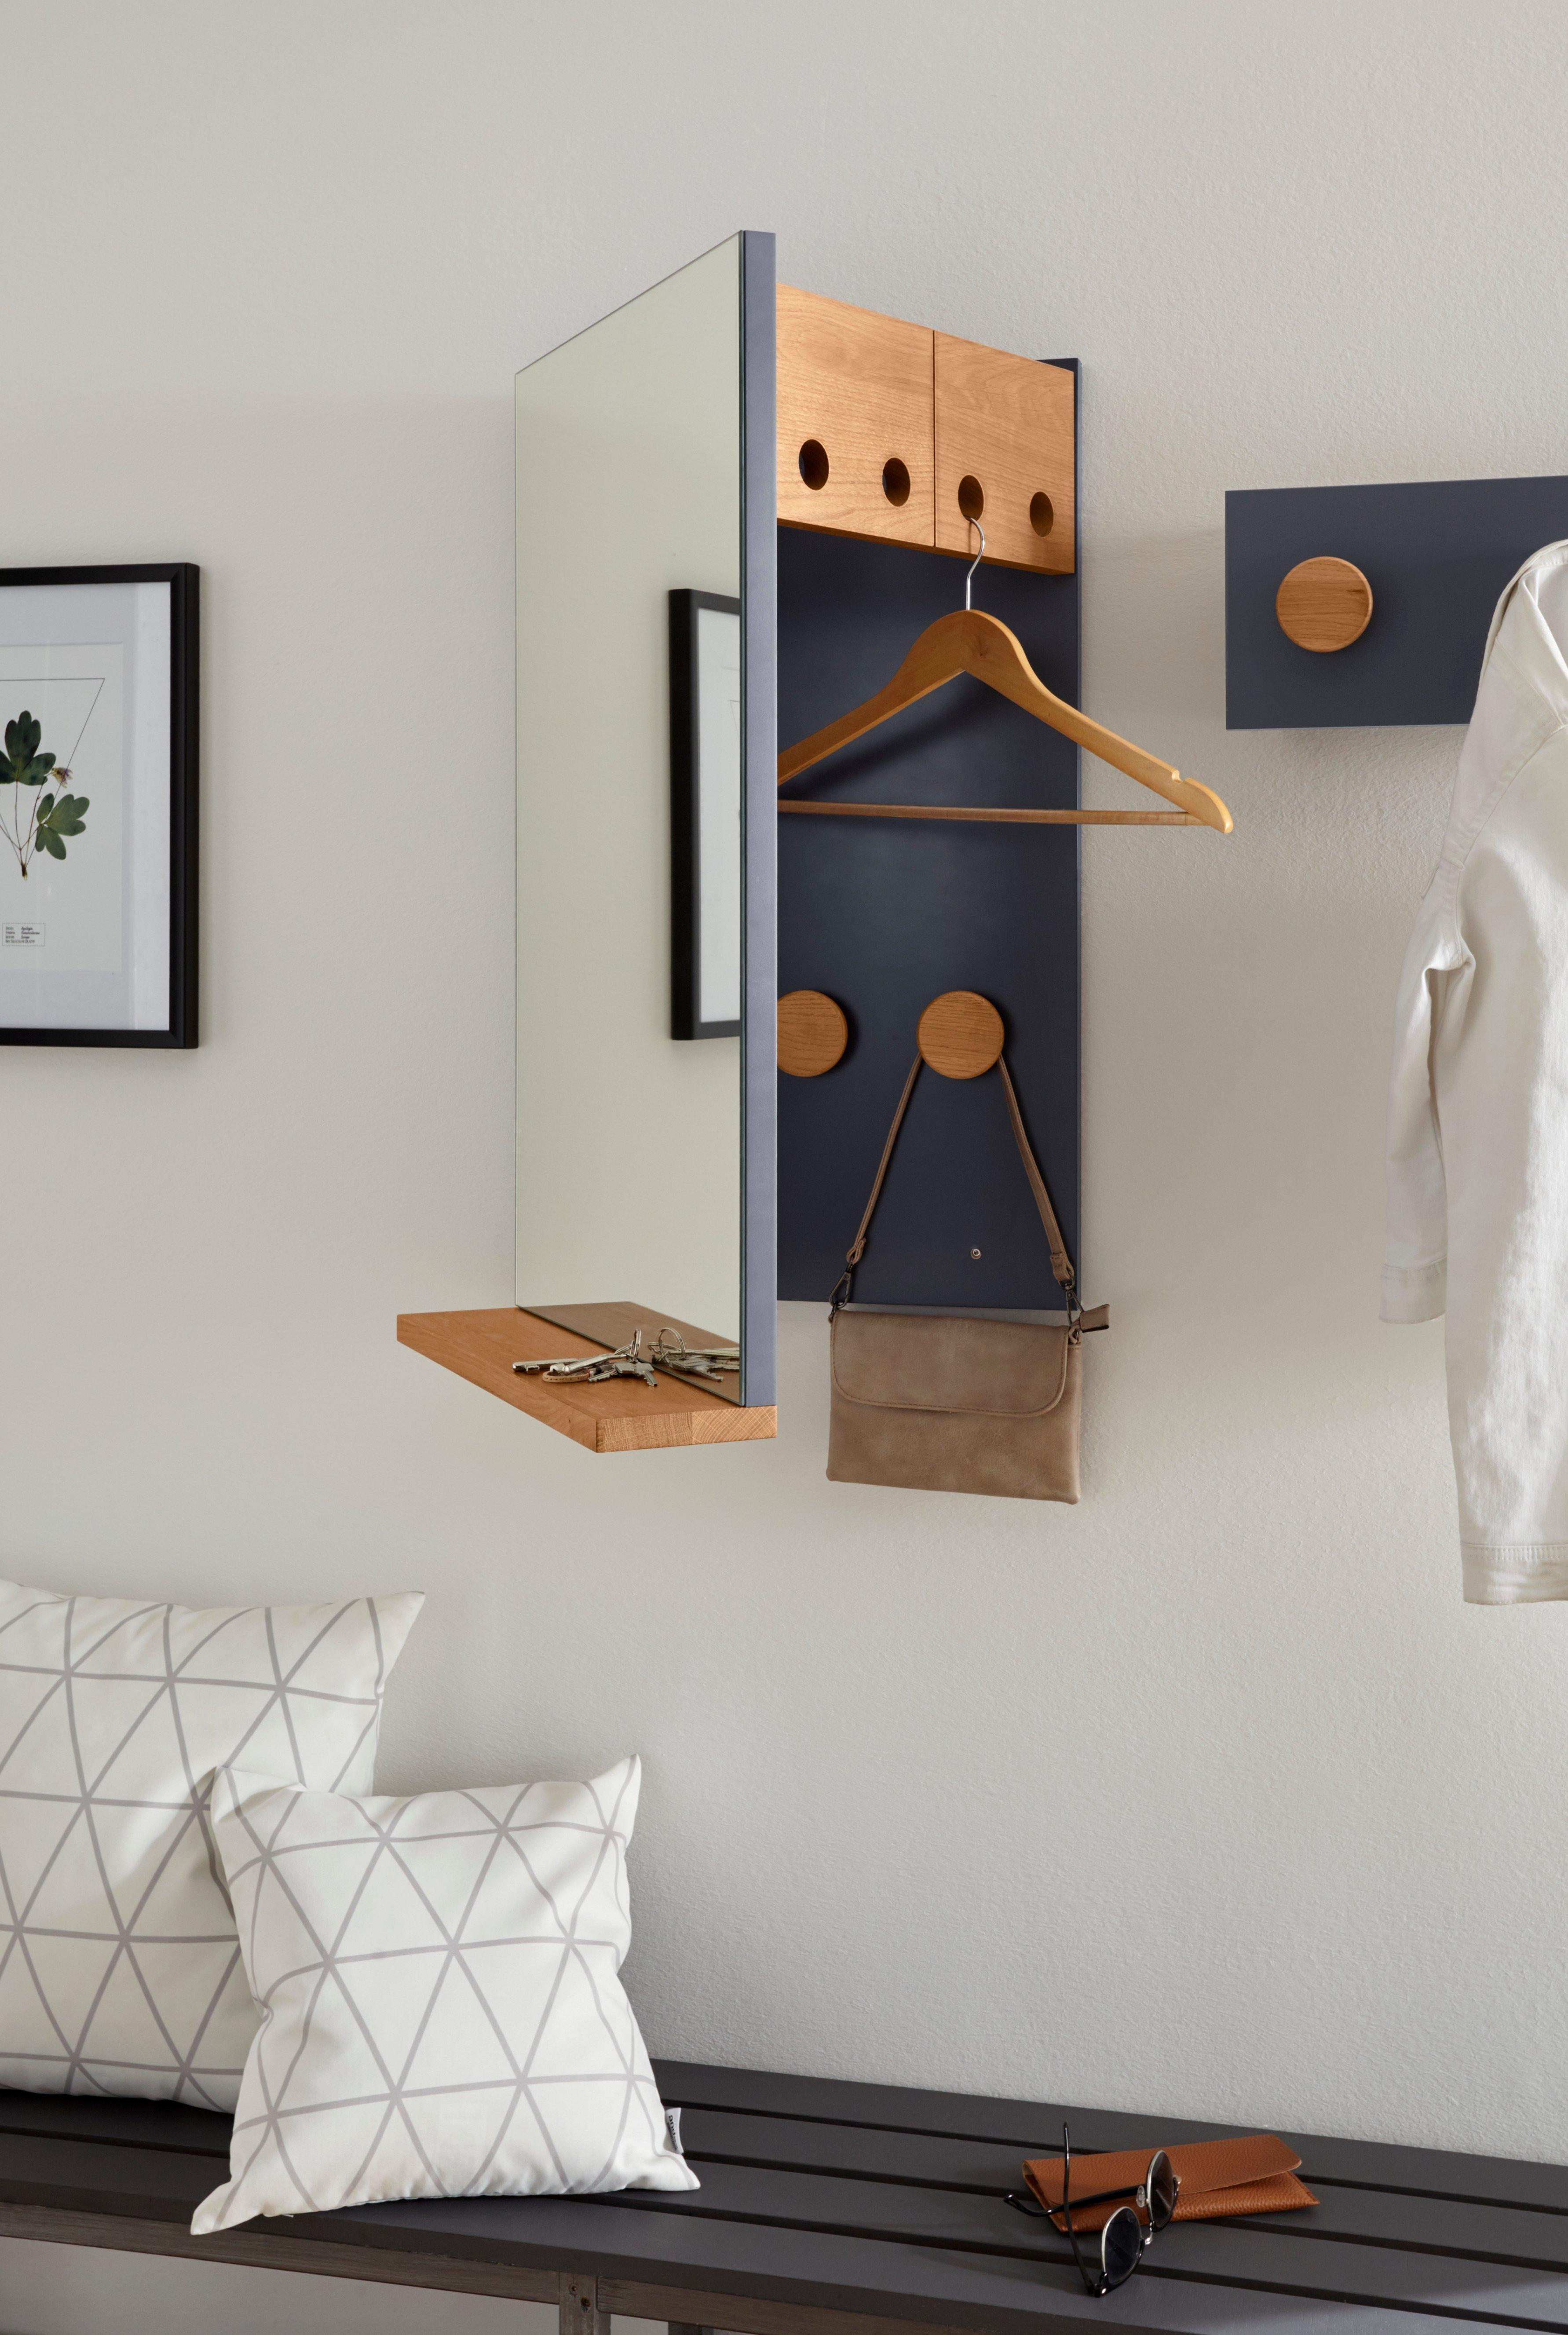 andas spiegel Folder ruimtebesparende inklapfunctie, breedte 50 cm, spiegelkast, kledingkast design by michael hilgers. bij OTTO online kopen